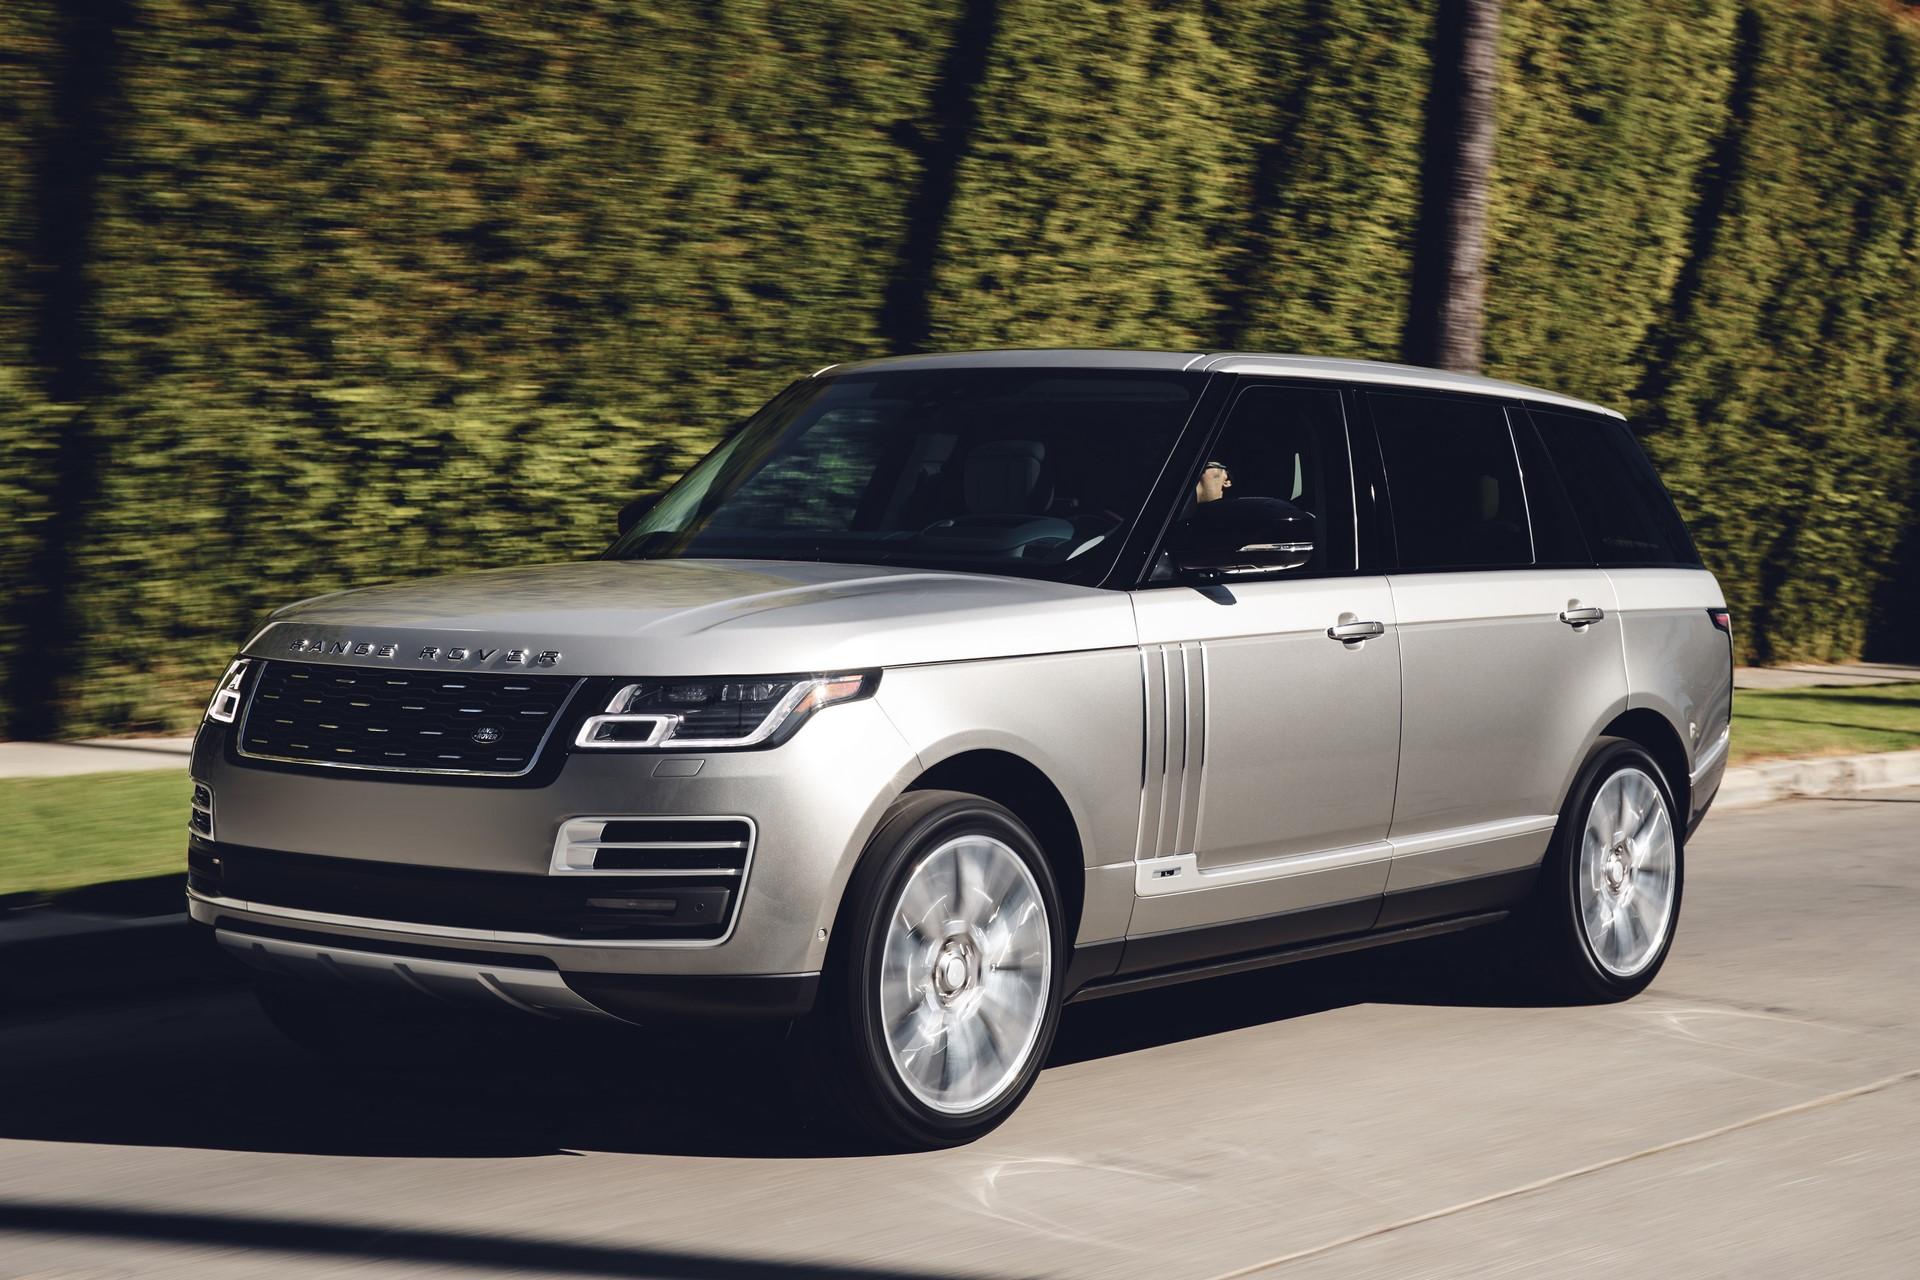 Range Rover SVAutobiography 2018 (14)